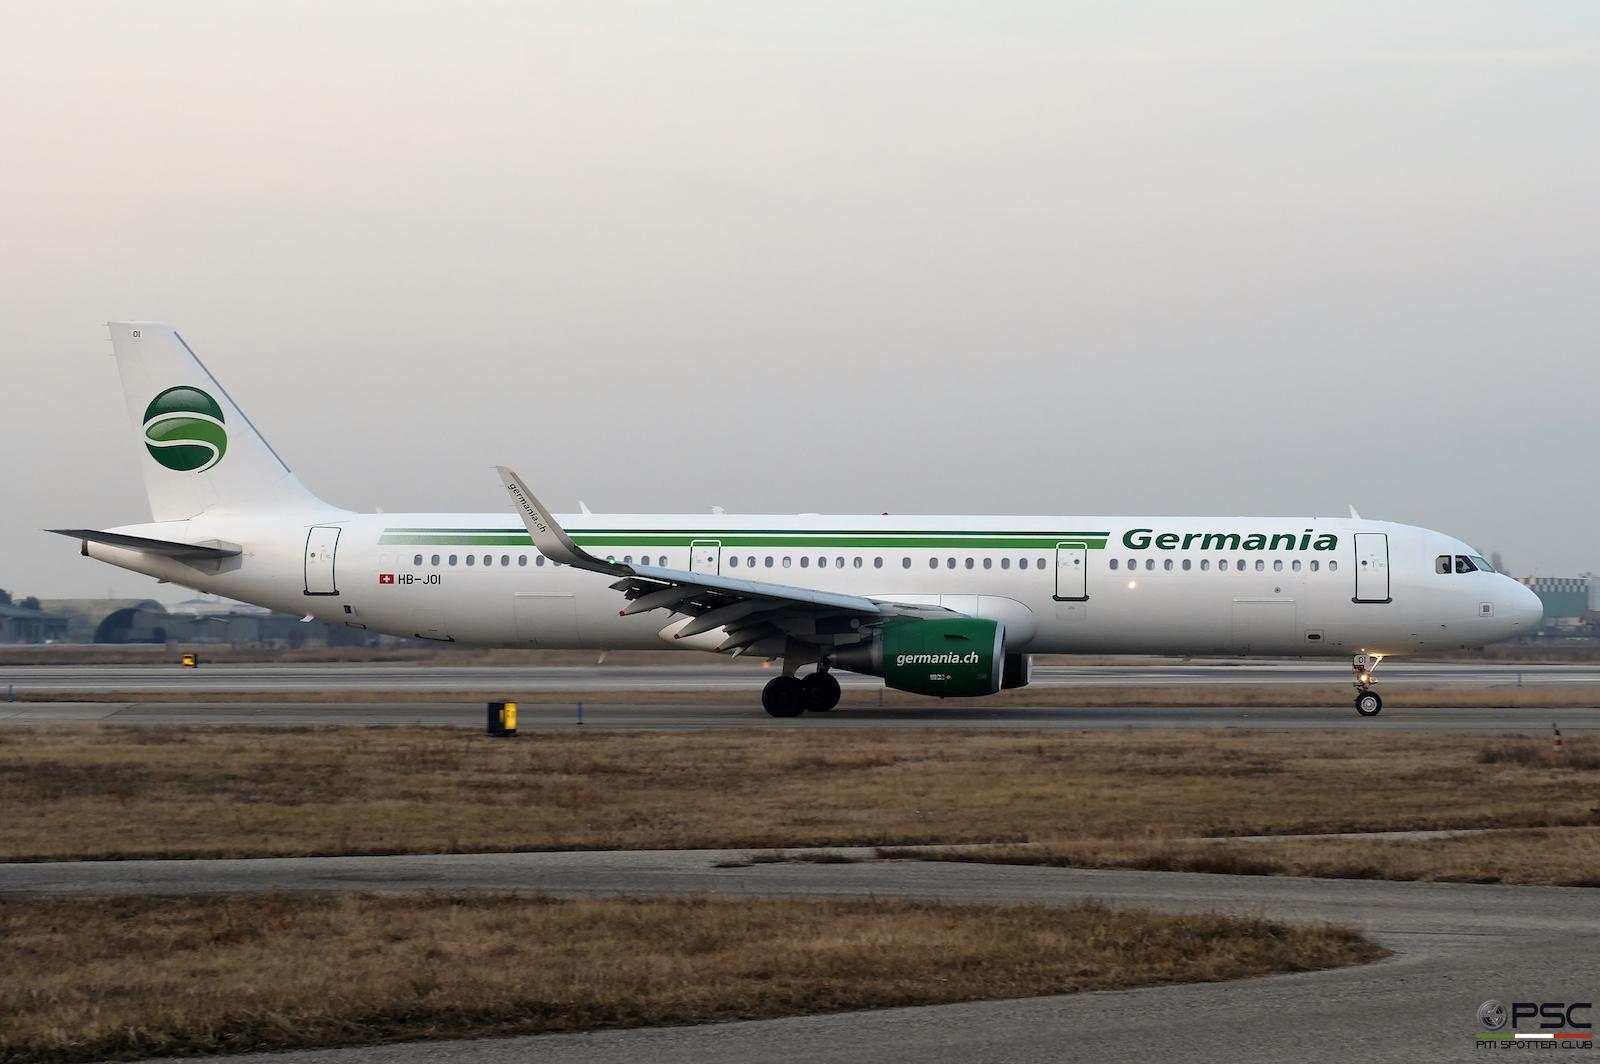 HB-JOI A321-211 5843 Germania Flug @ Aeroporto di Verona - 28.01.2017  © Piti Spotter Club Verona